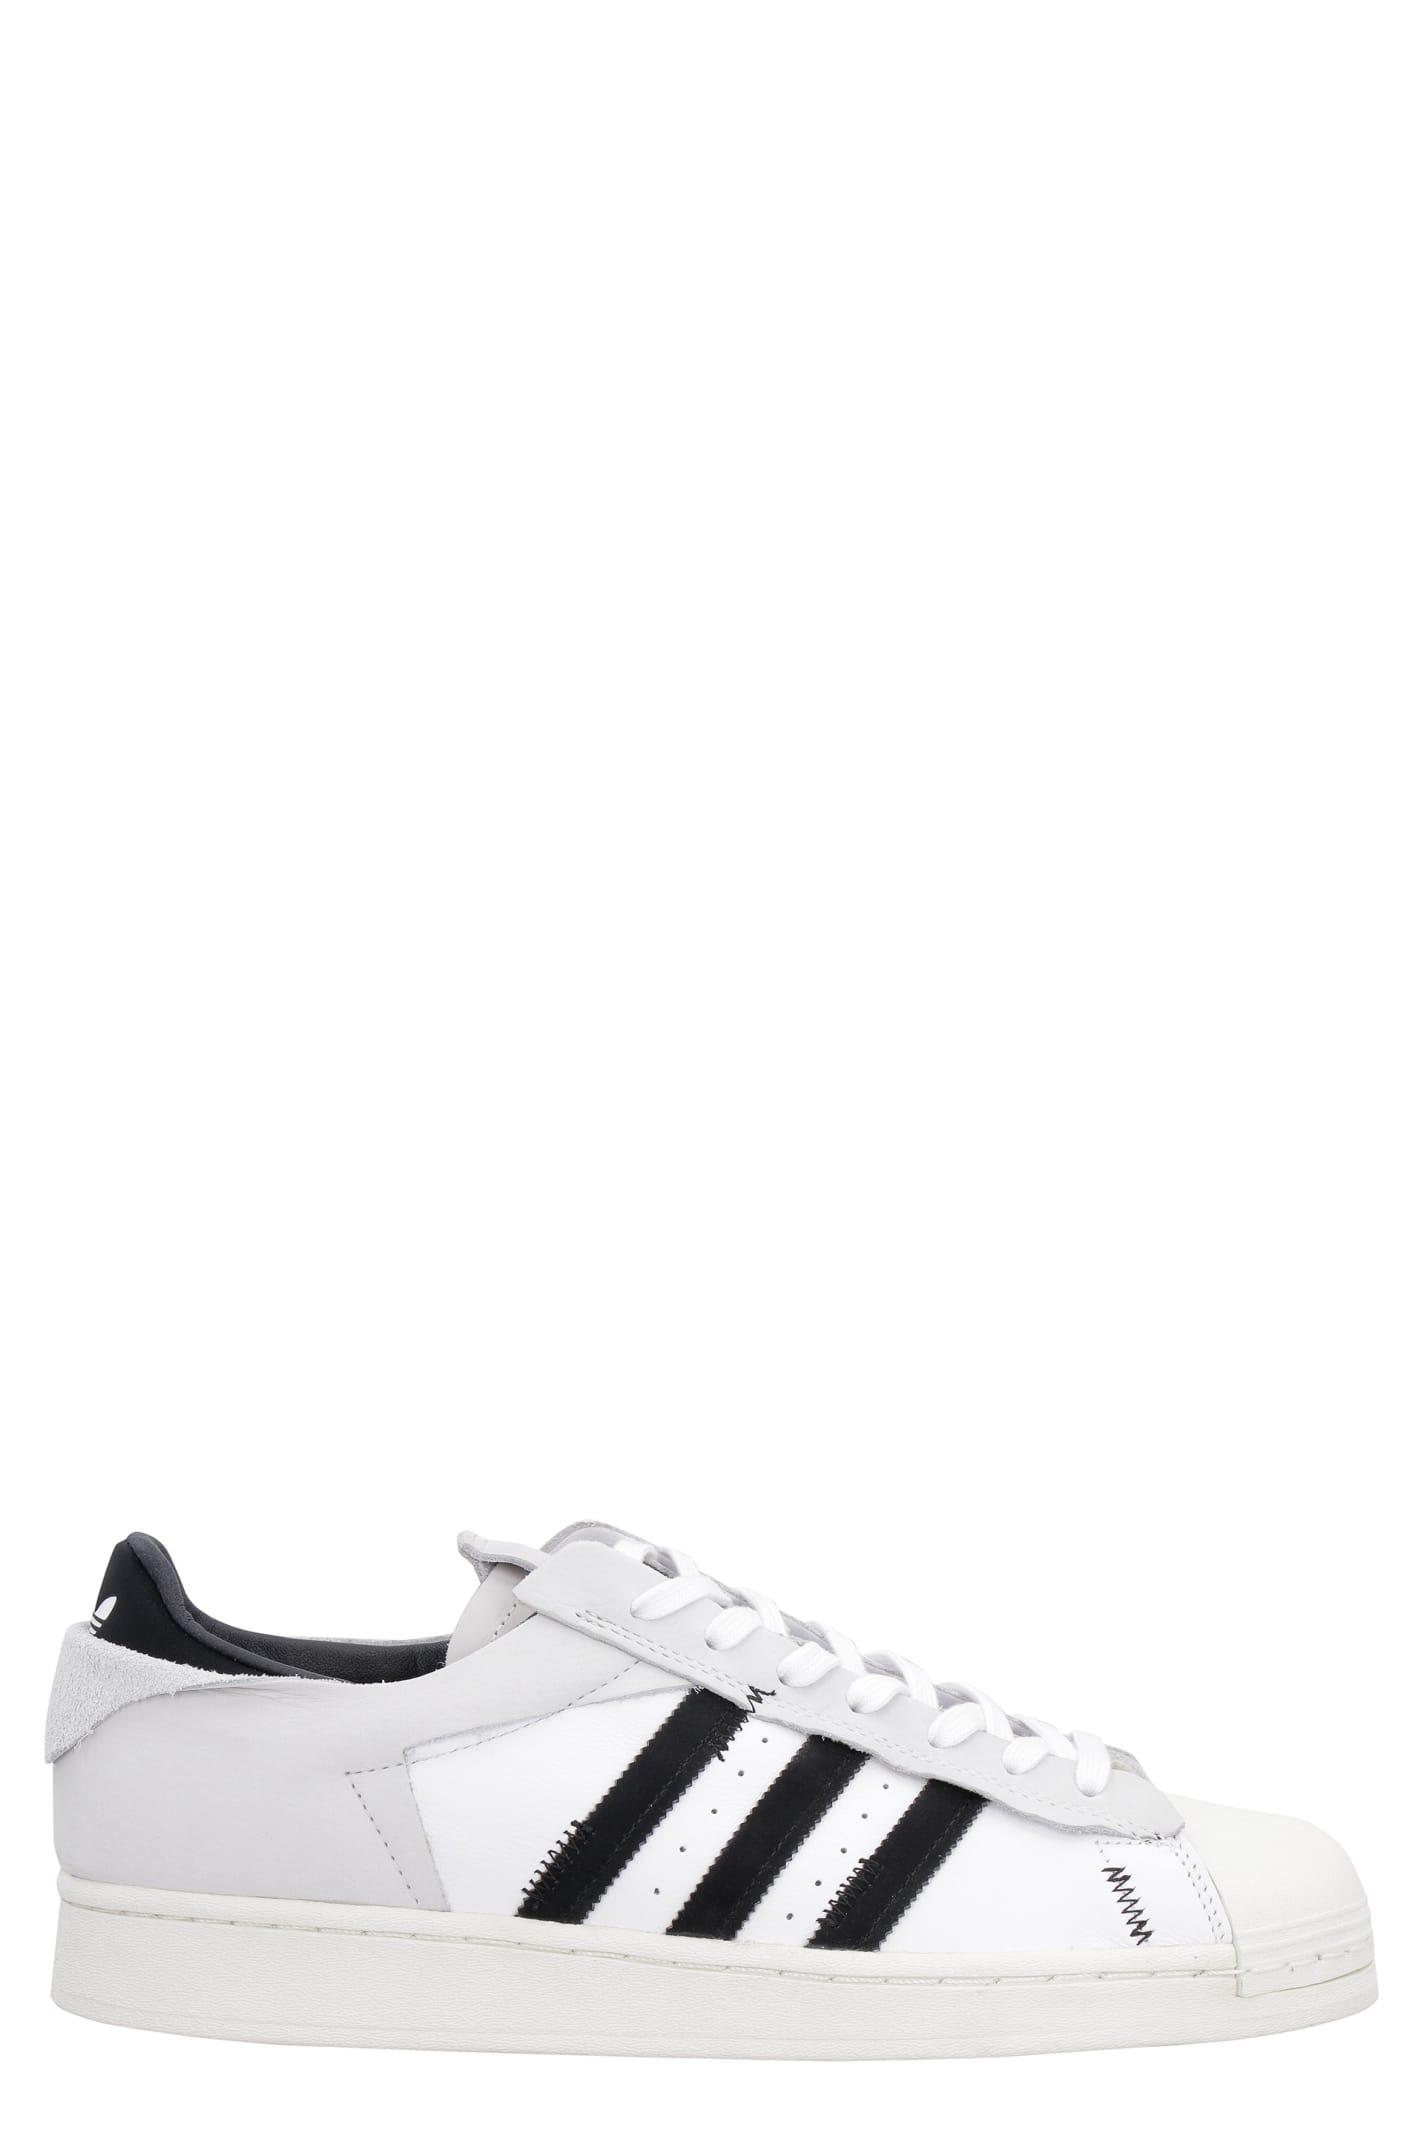 Adidas Superstar Ws2 Low-top Sneakers